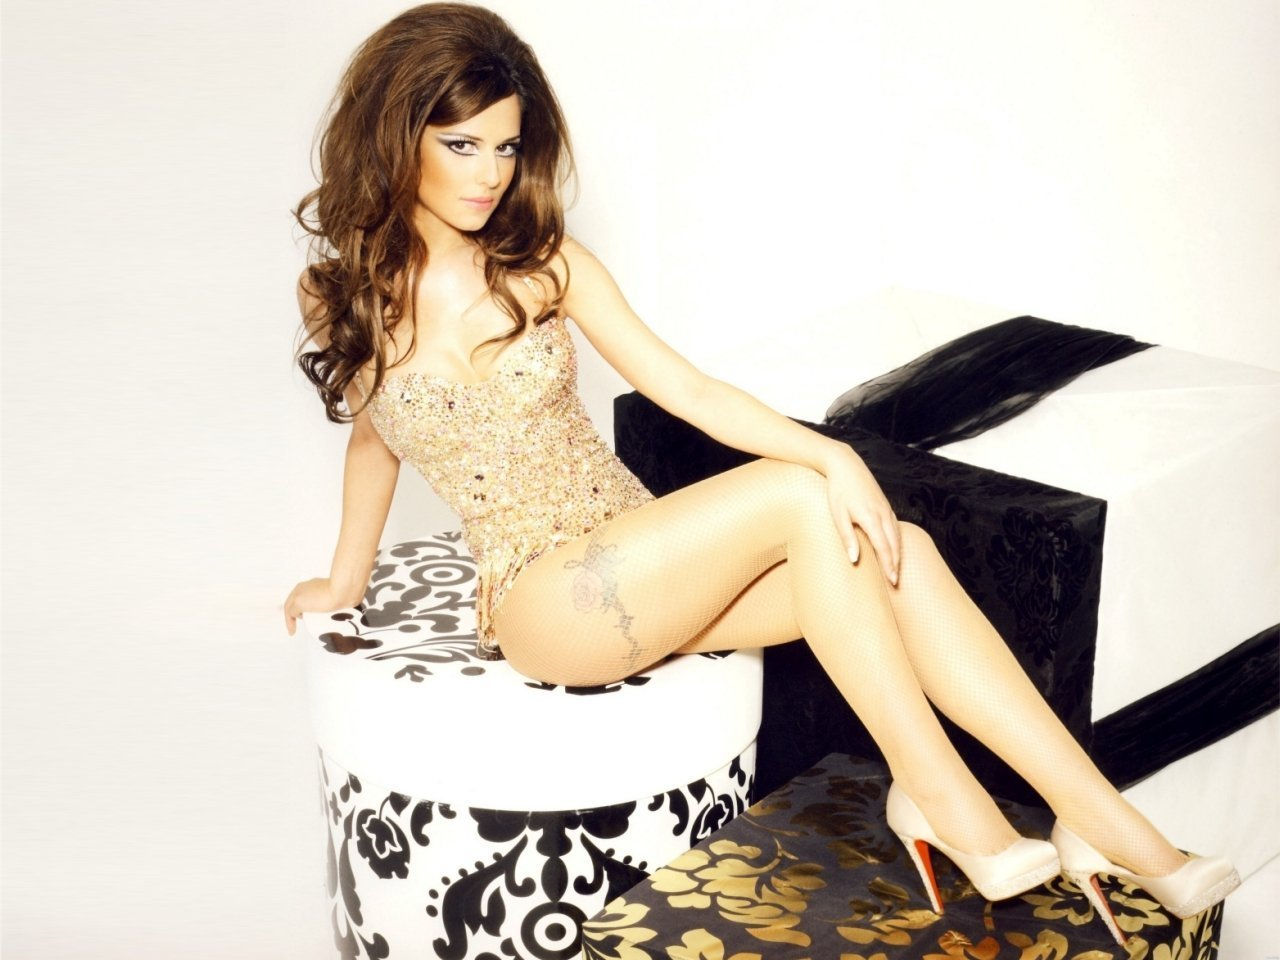 cheryl-cole-leaked-pics-in-bikini